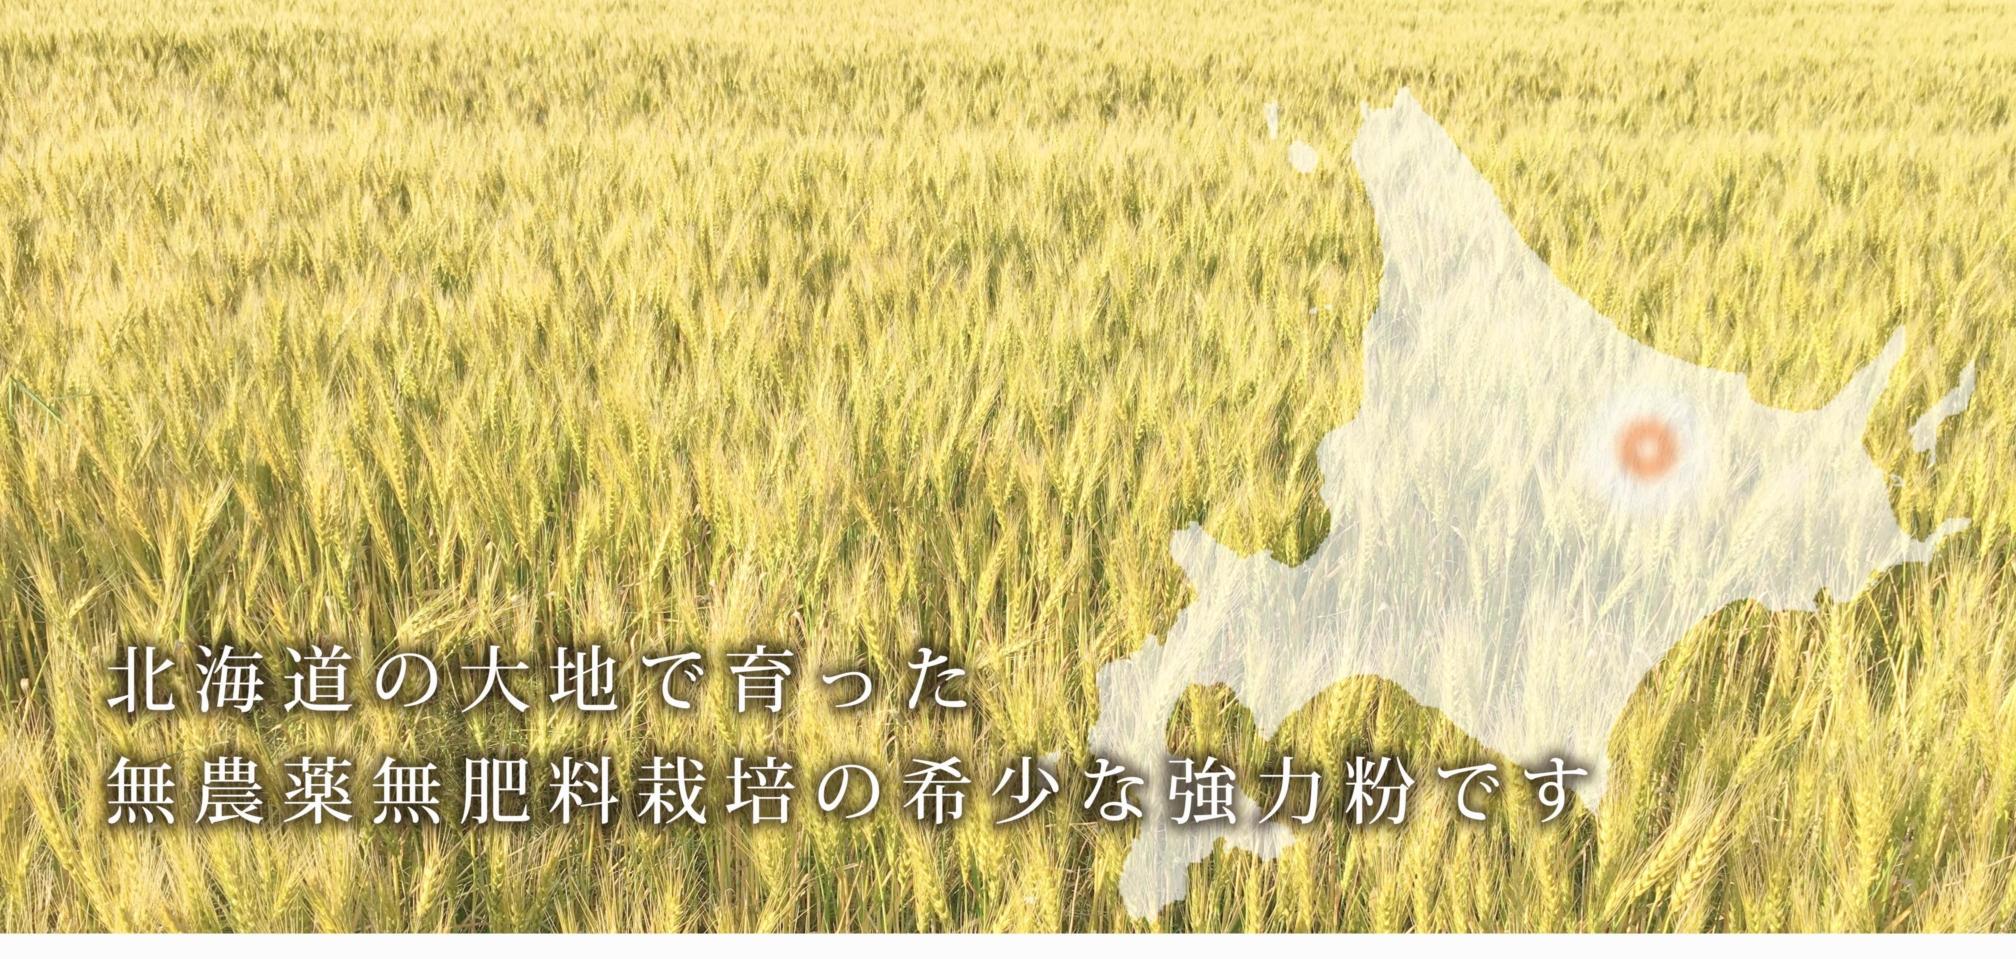 https://gelato-naturale.com/wp-content/uploads/2018/05/kyouriki-gazou1-3-2016x959.jpg